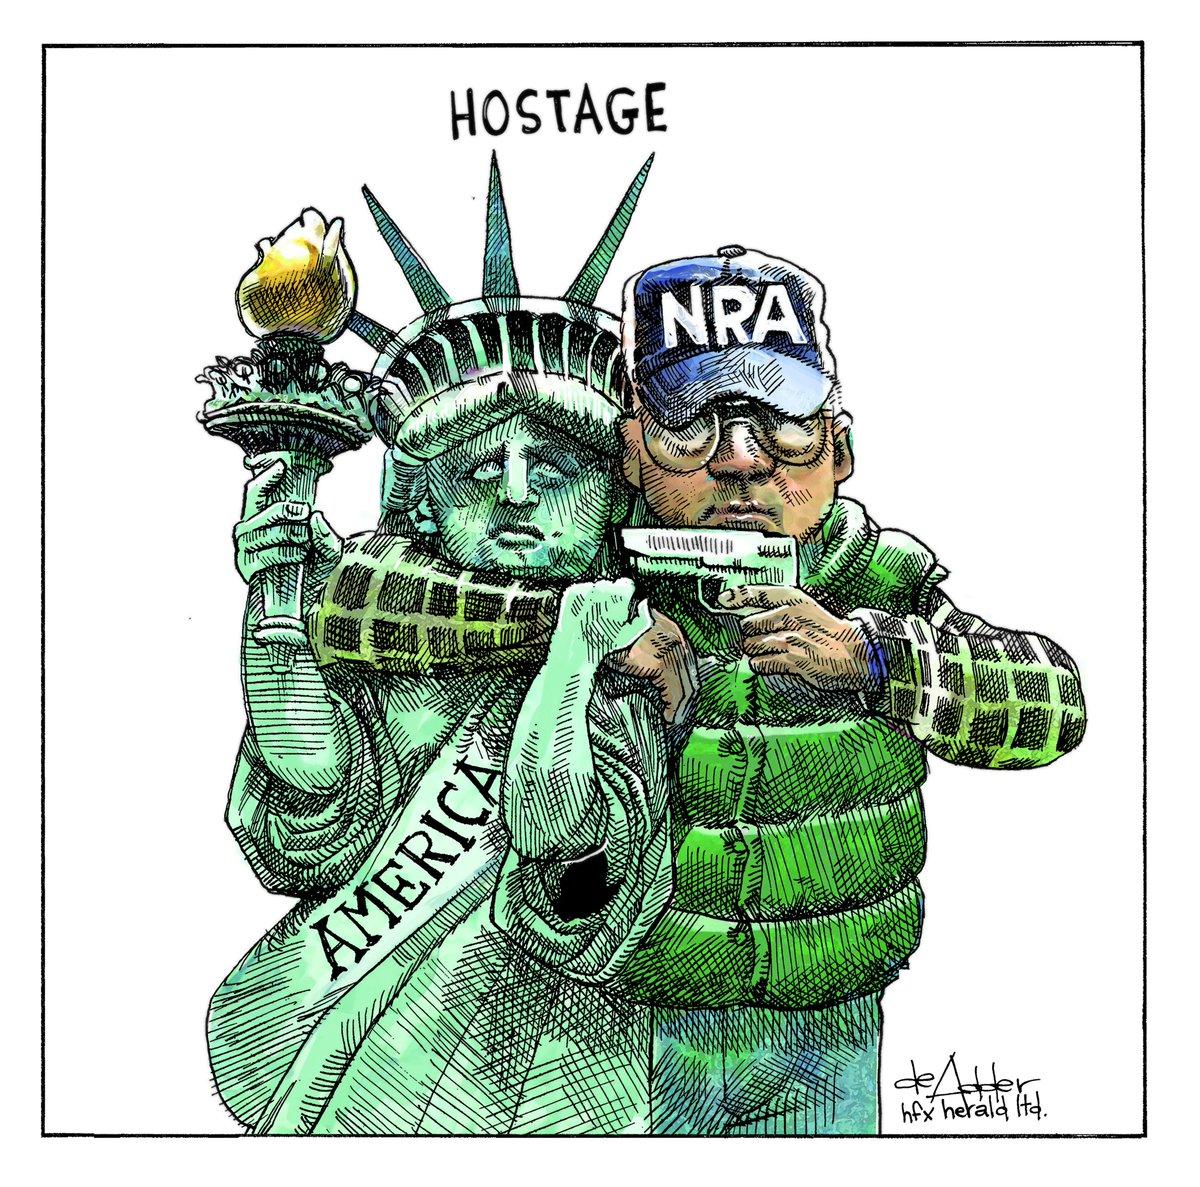 Another school shooting. Cartoonss for @newcounterpoint @TorontoStar @chronicleherald #schoolshooting #school #NRA #SantaClaritaStrong #santaclarita